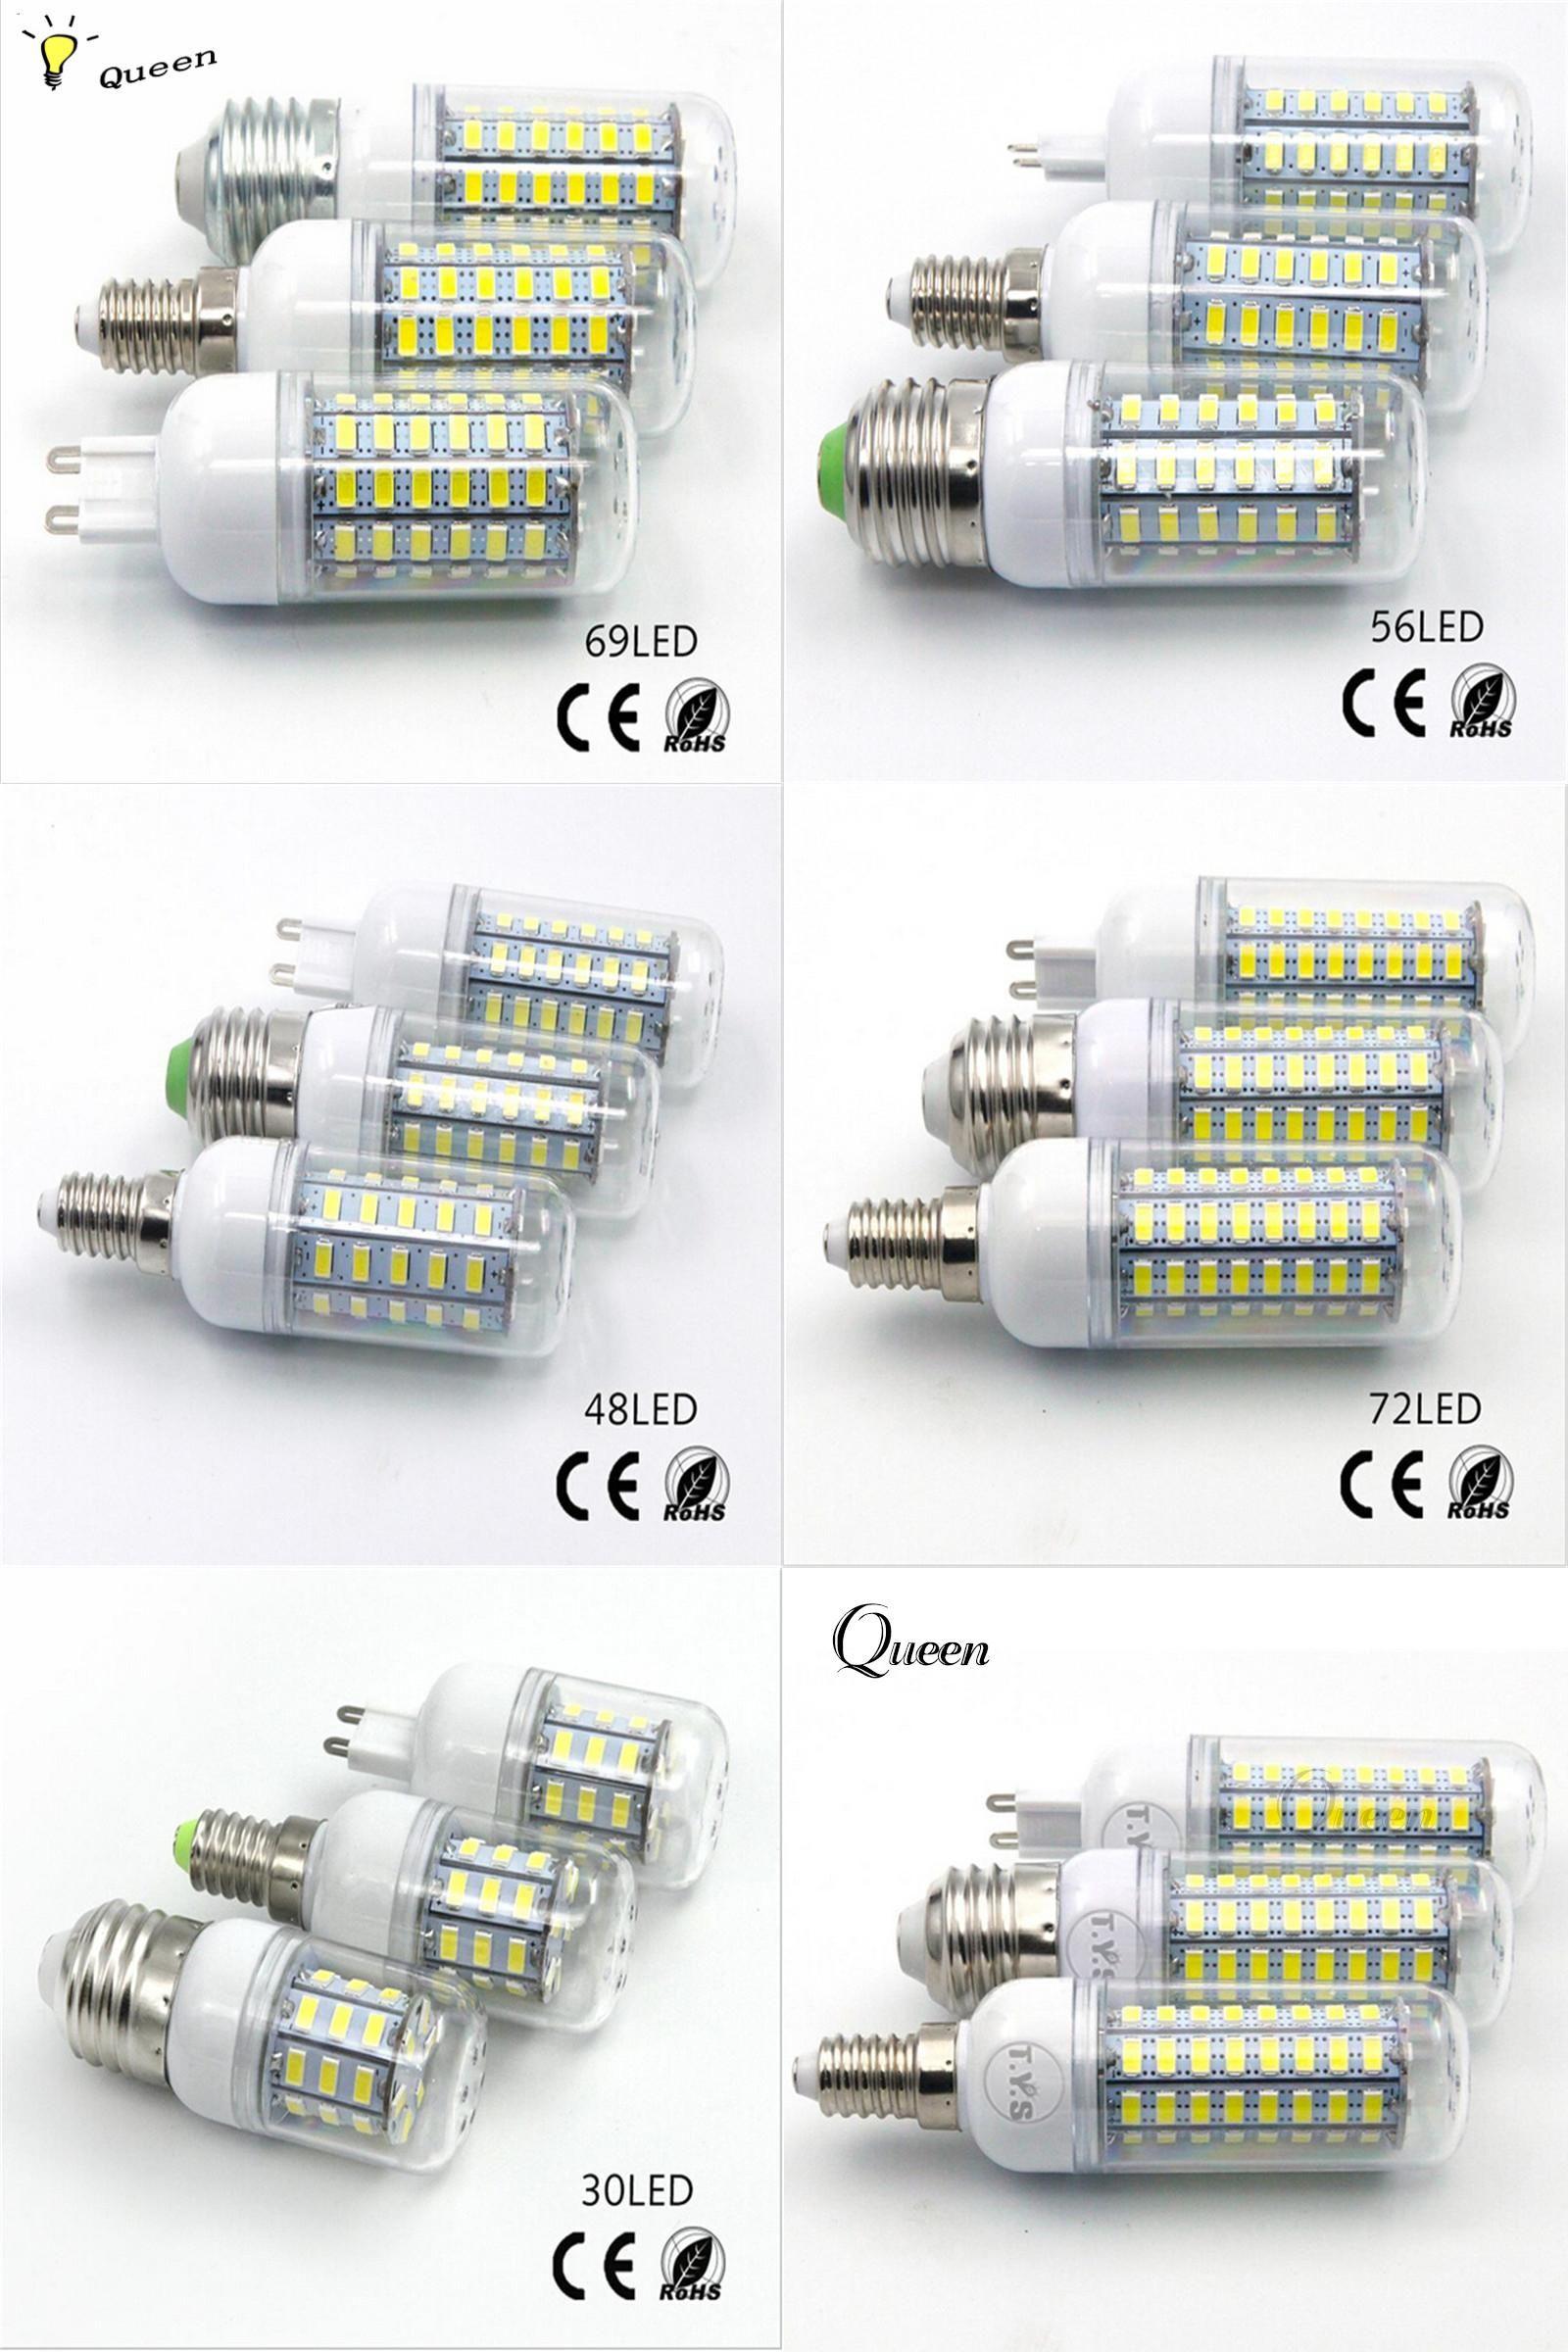 Visit To Buy Led Lamp Bulb E27 Bombillas Led 20w Smd 5730 Lamp E14 Lamparas De Led Para Casa Lights 220v G9 Ampolletas With Images Led 20w Energy Saving Lamp Save Energy